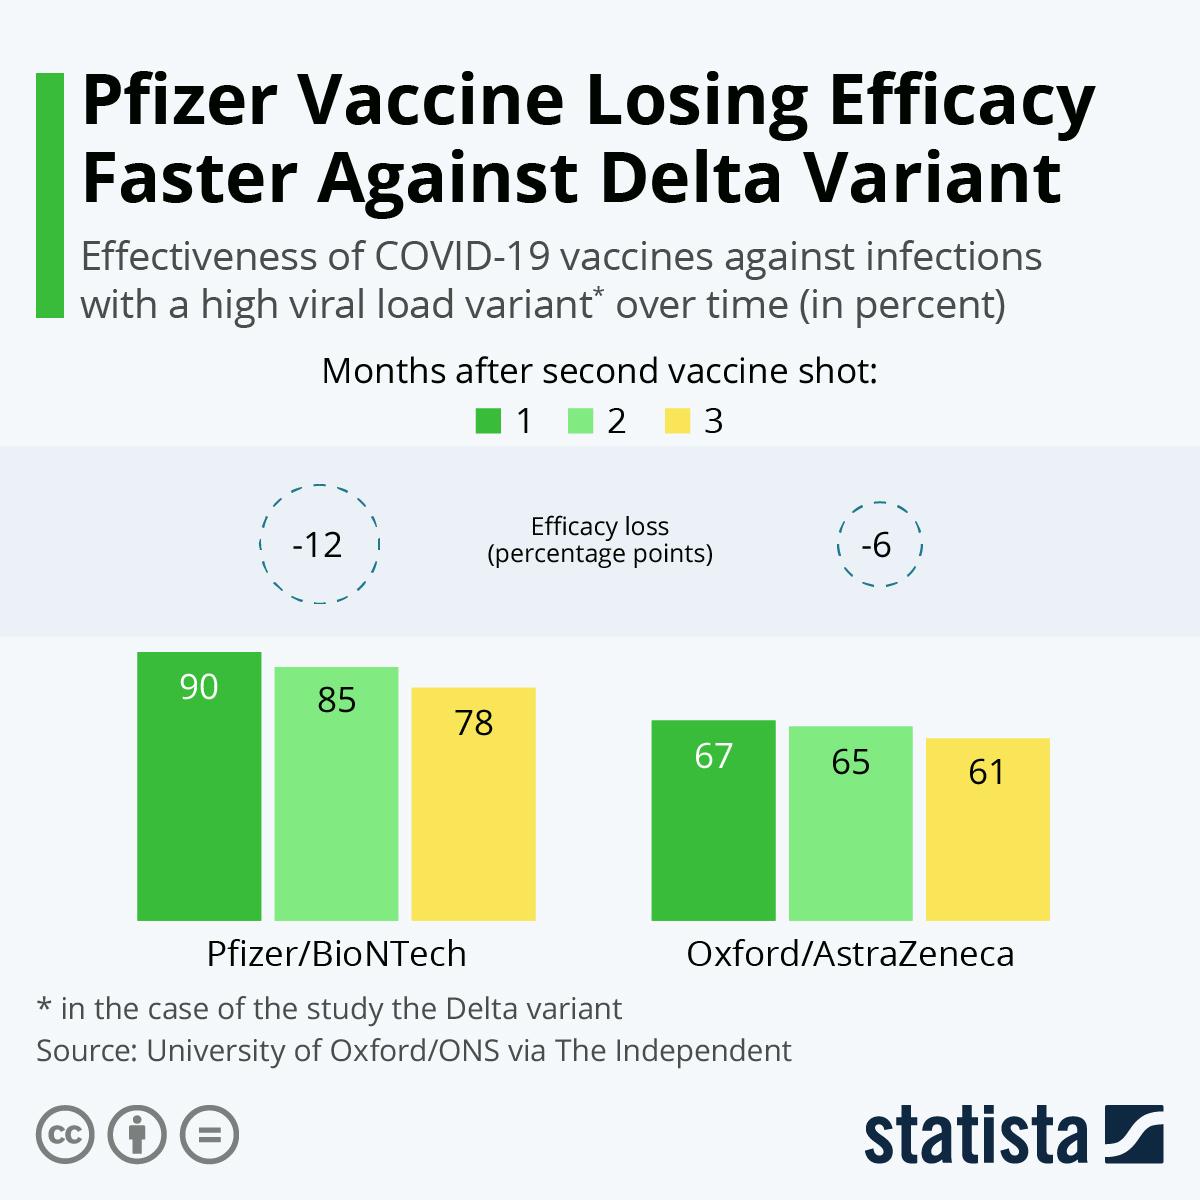 Pfizer Losing Efficacy Faster Against Delta Variant